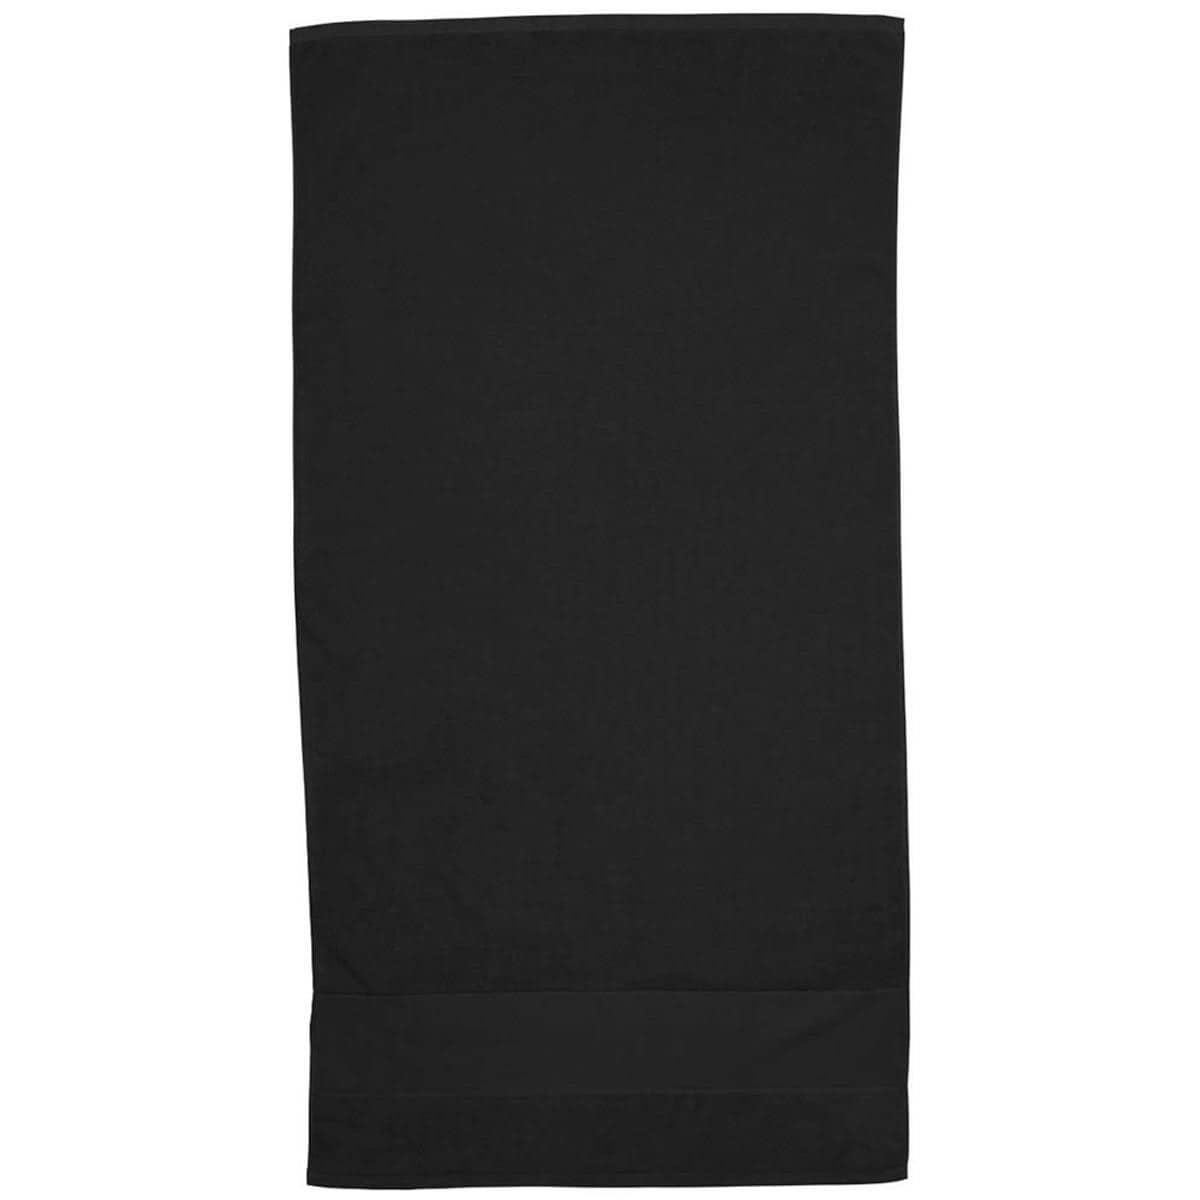 Black Super Soft Touch Towel Custom Printed